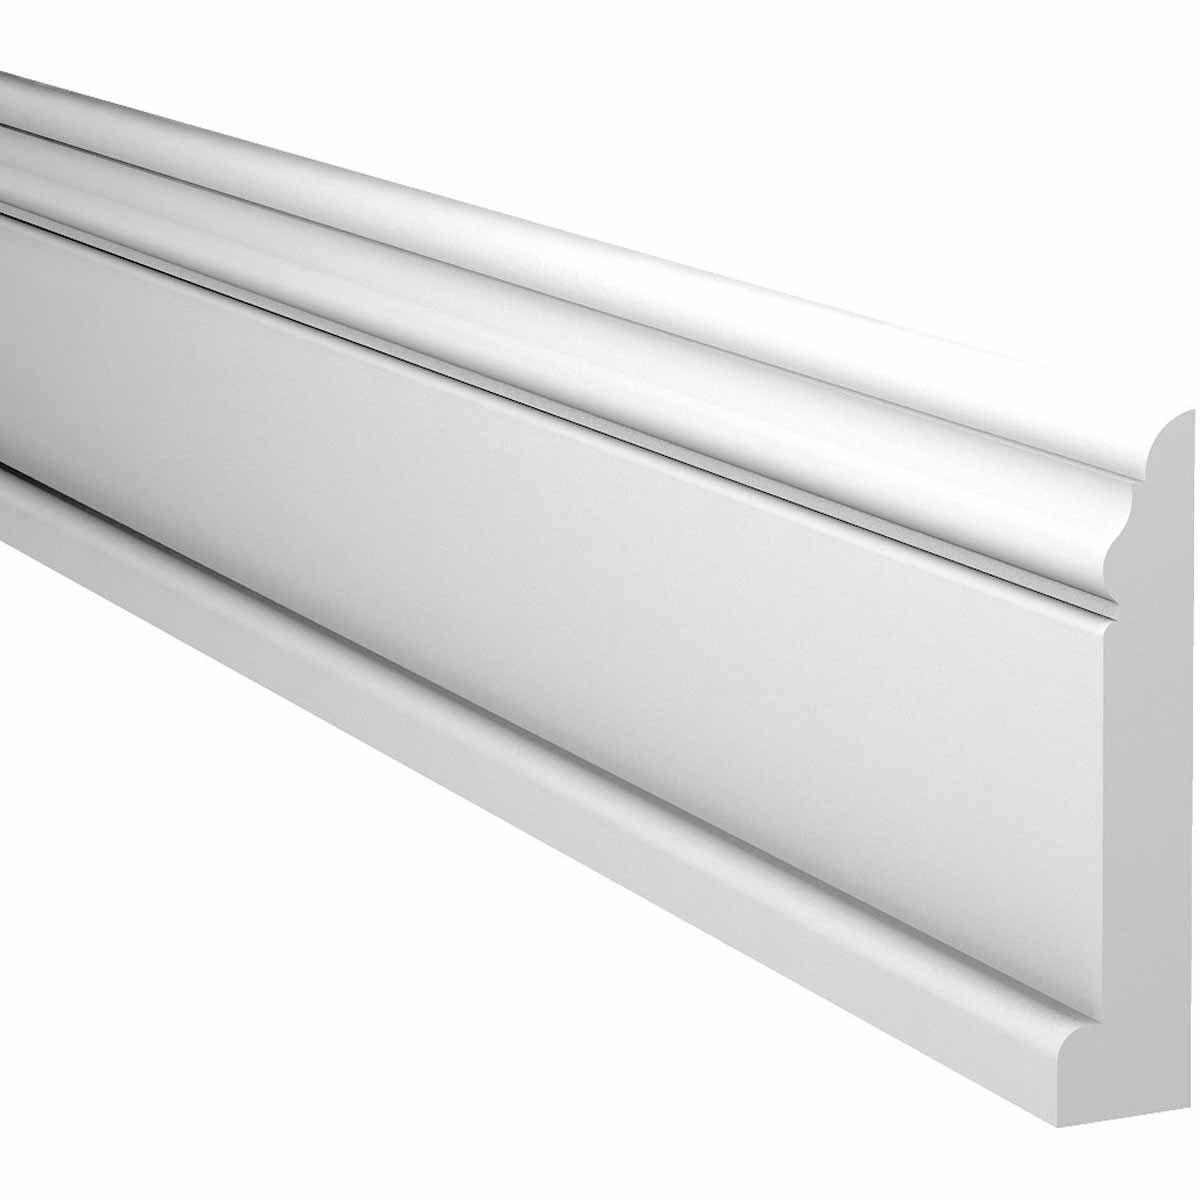 5 1 4 Inch H X 1 1 8 Inch P X 144 Inch L Baseboard Moulding Baseboard Moulding Baseboards Buy Interior Doors